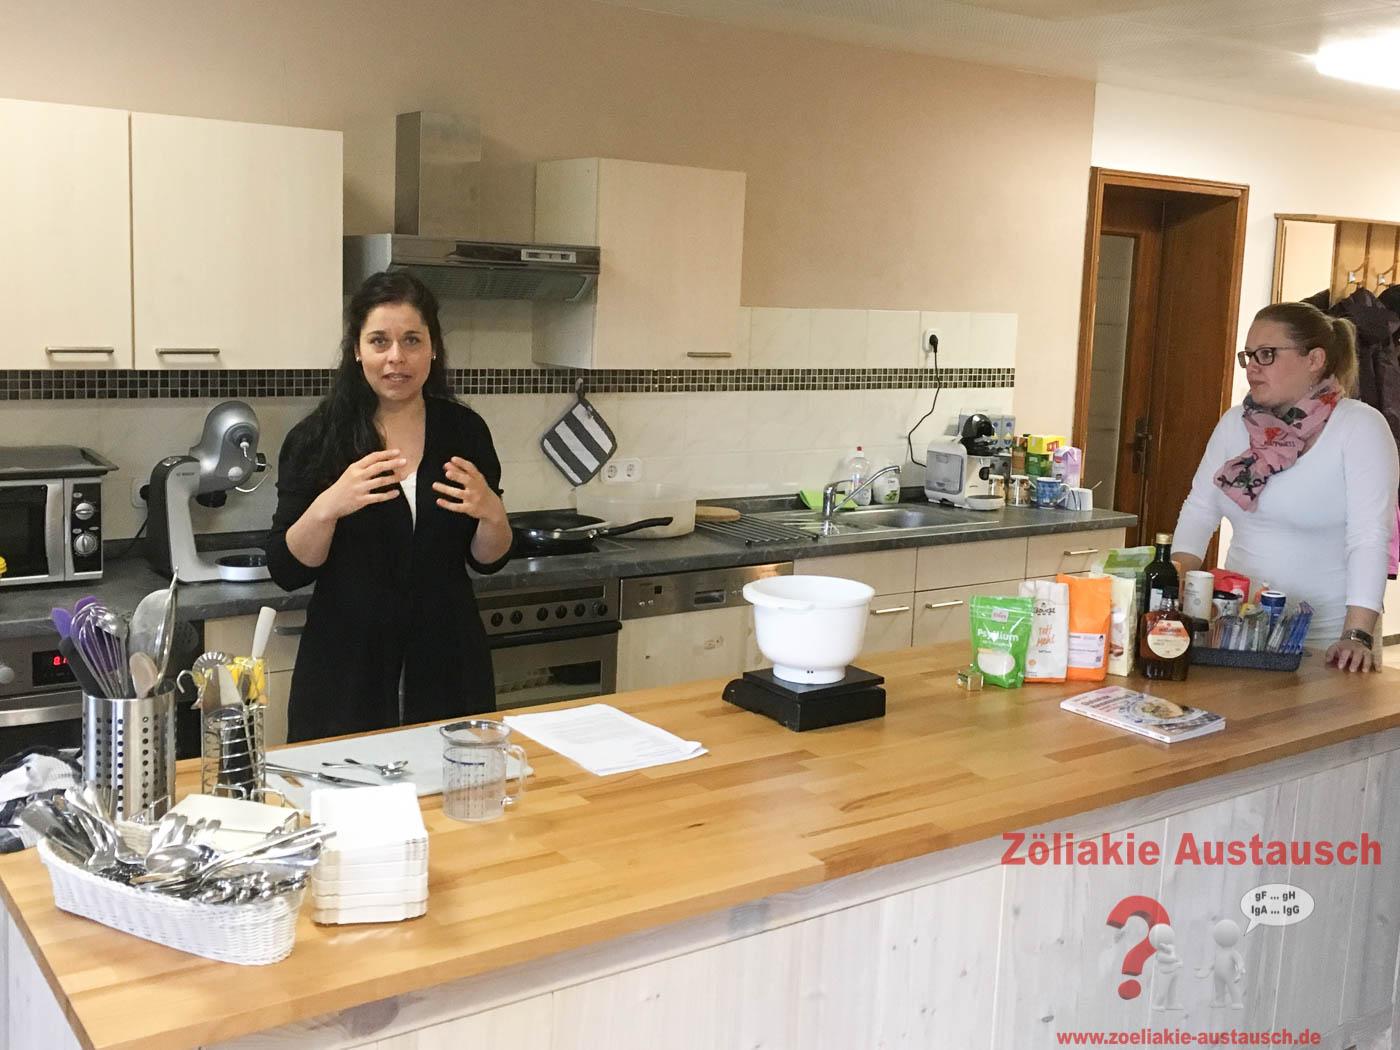 Zoeliakie_Austausch_Tanja_Gruber-Backkurs_2017-005